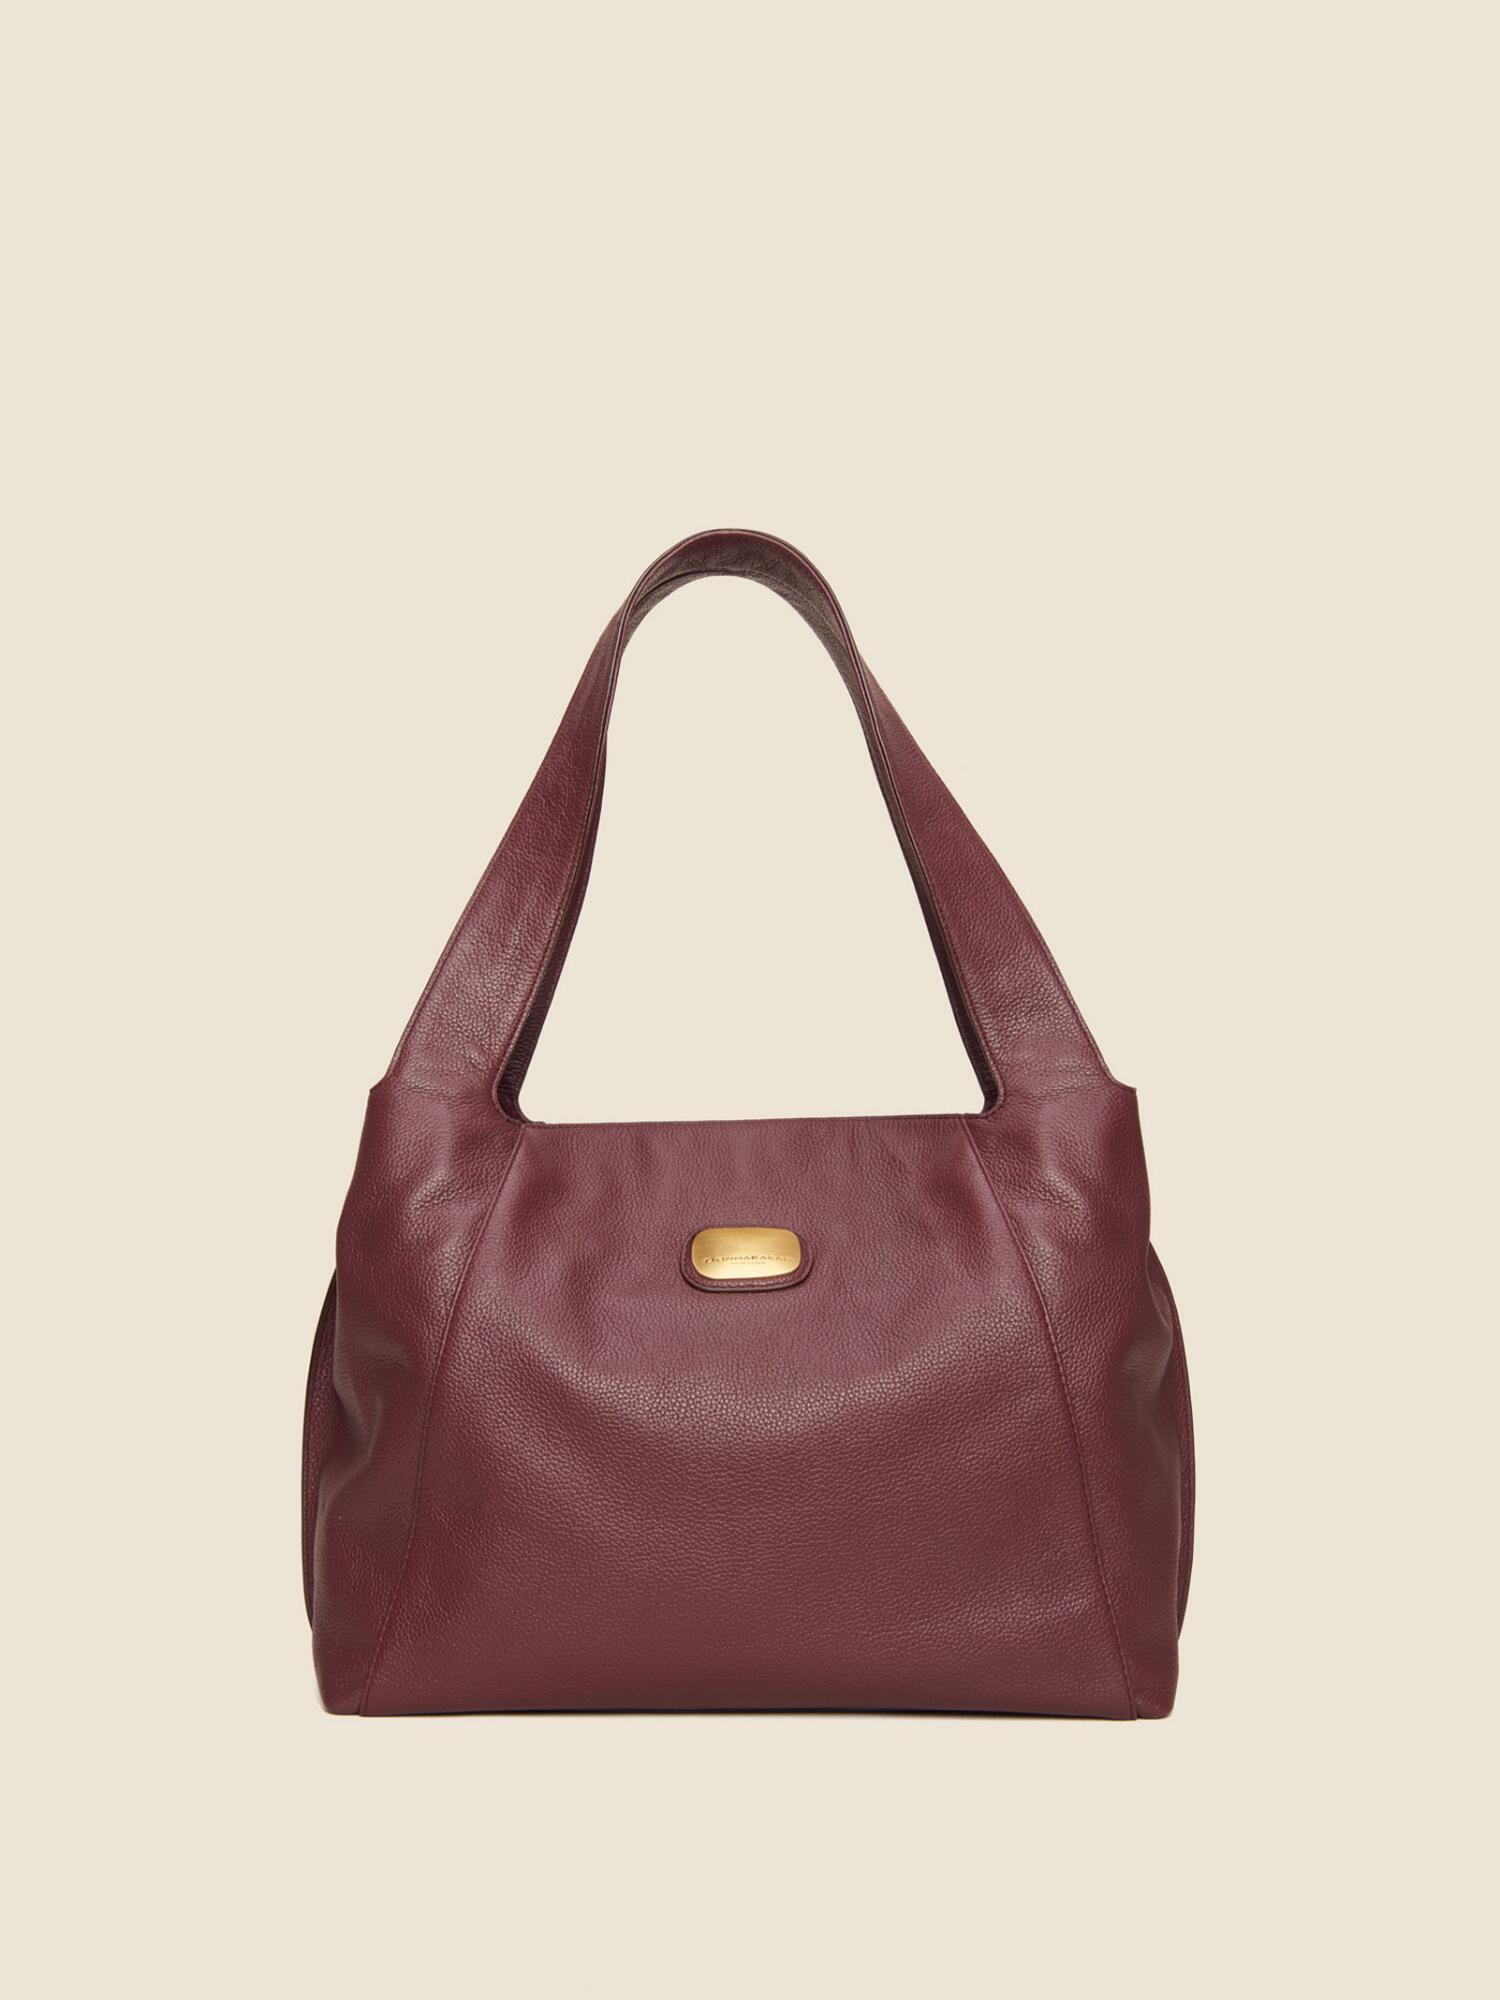 8463e49581b Donna Karan Leather Hobo Bag In Garnet | ModeSens